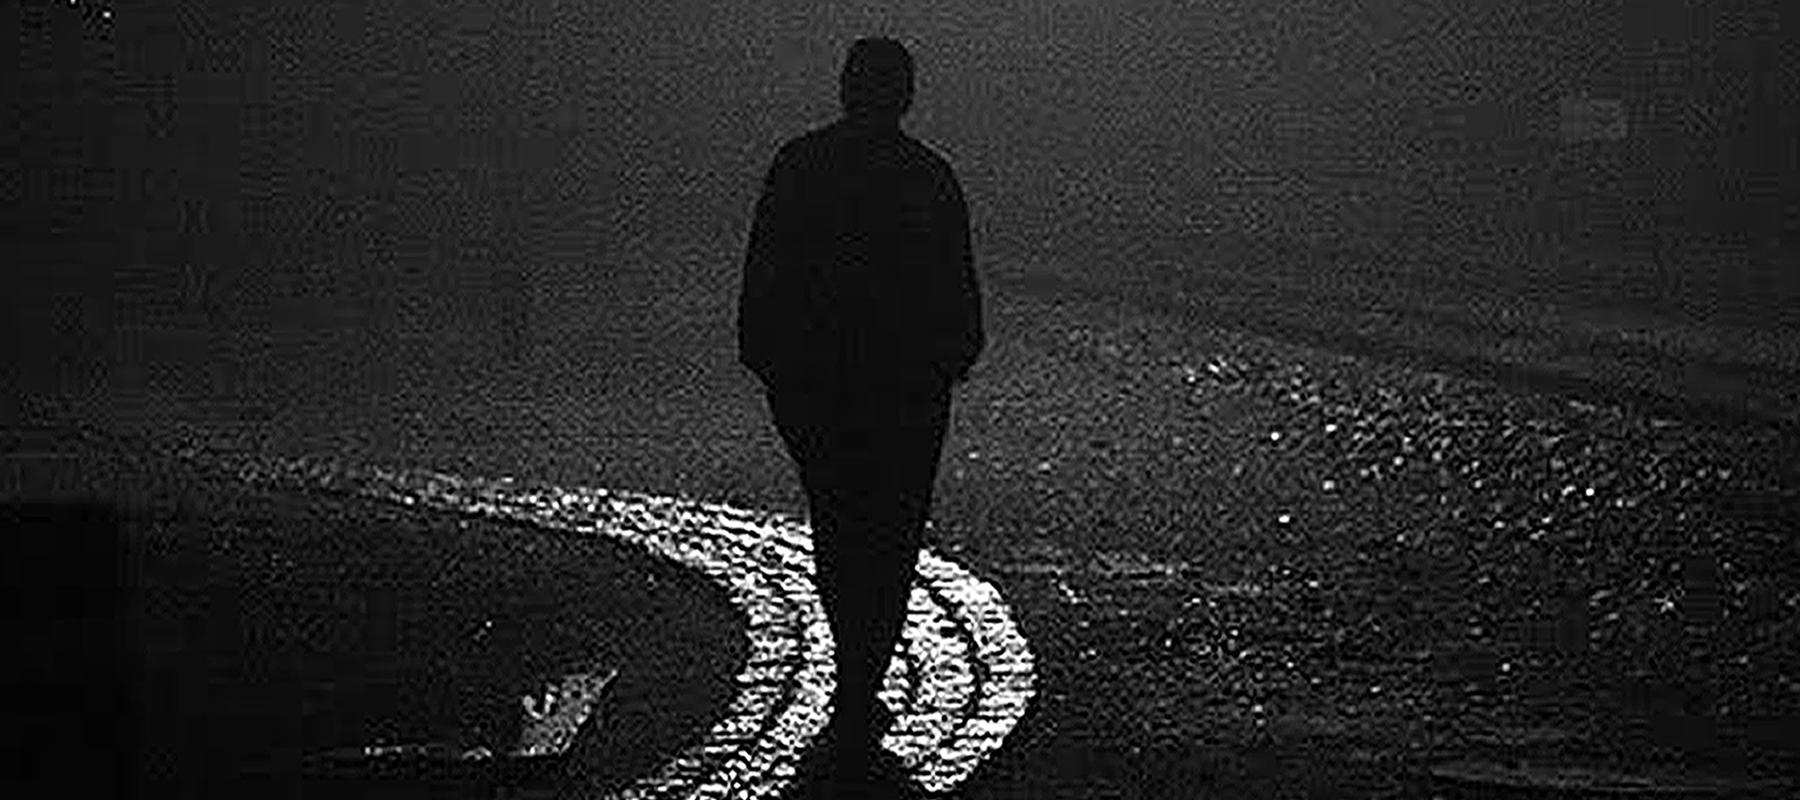 Noturno – um poema de Roberto Silva